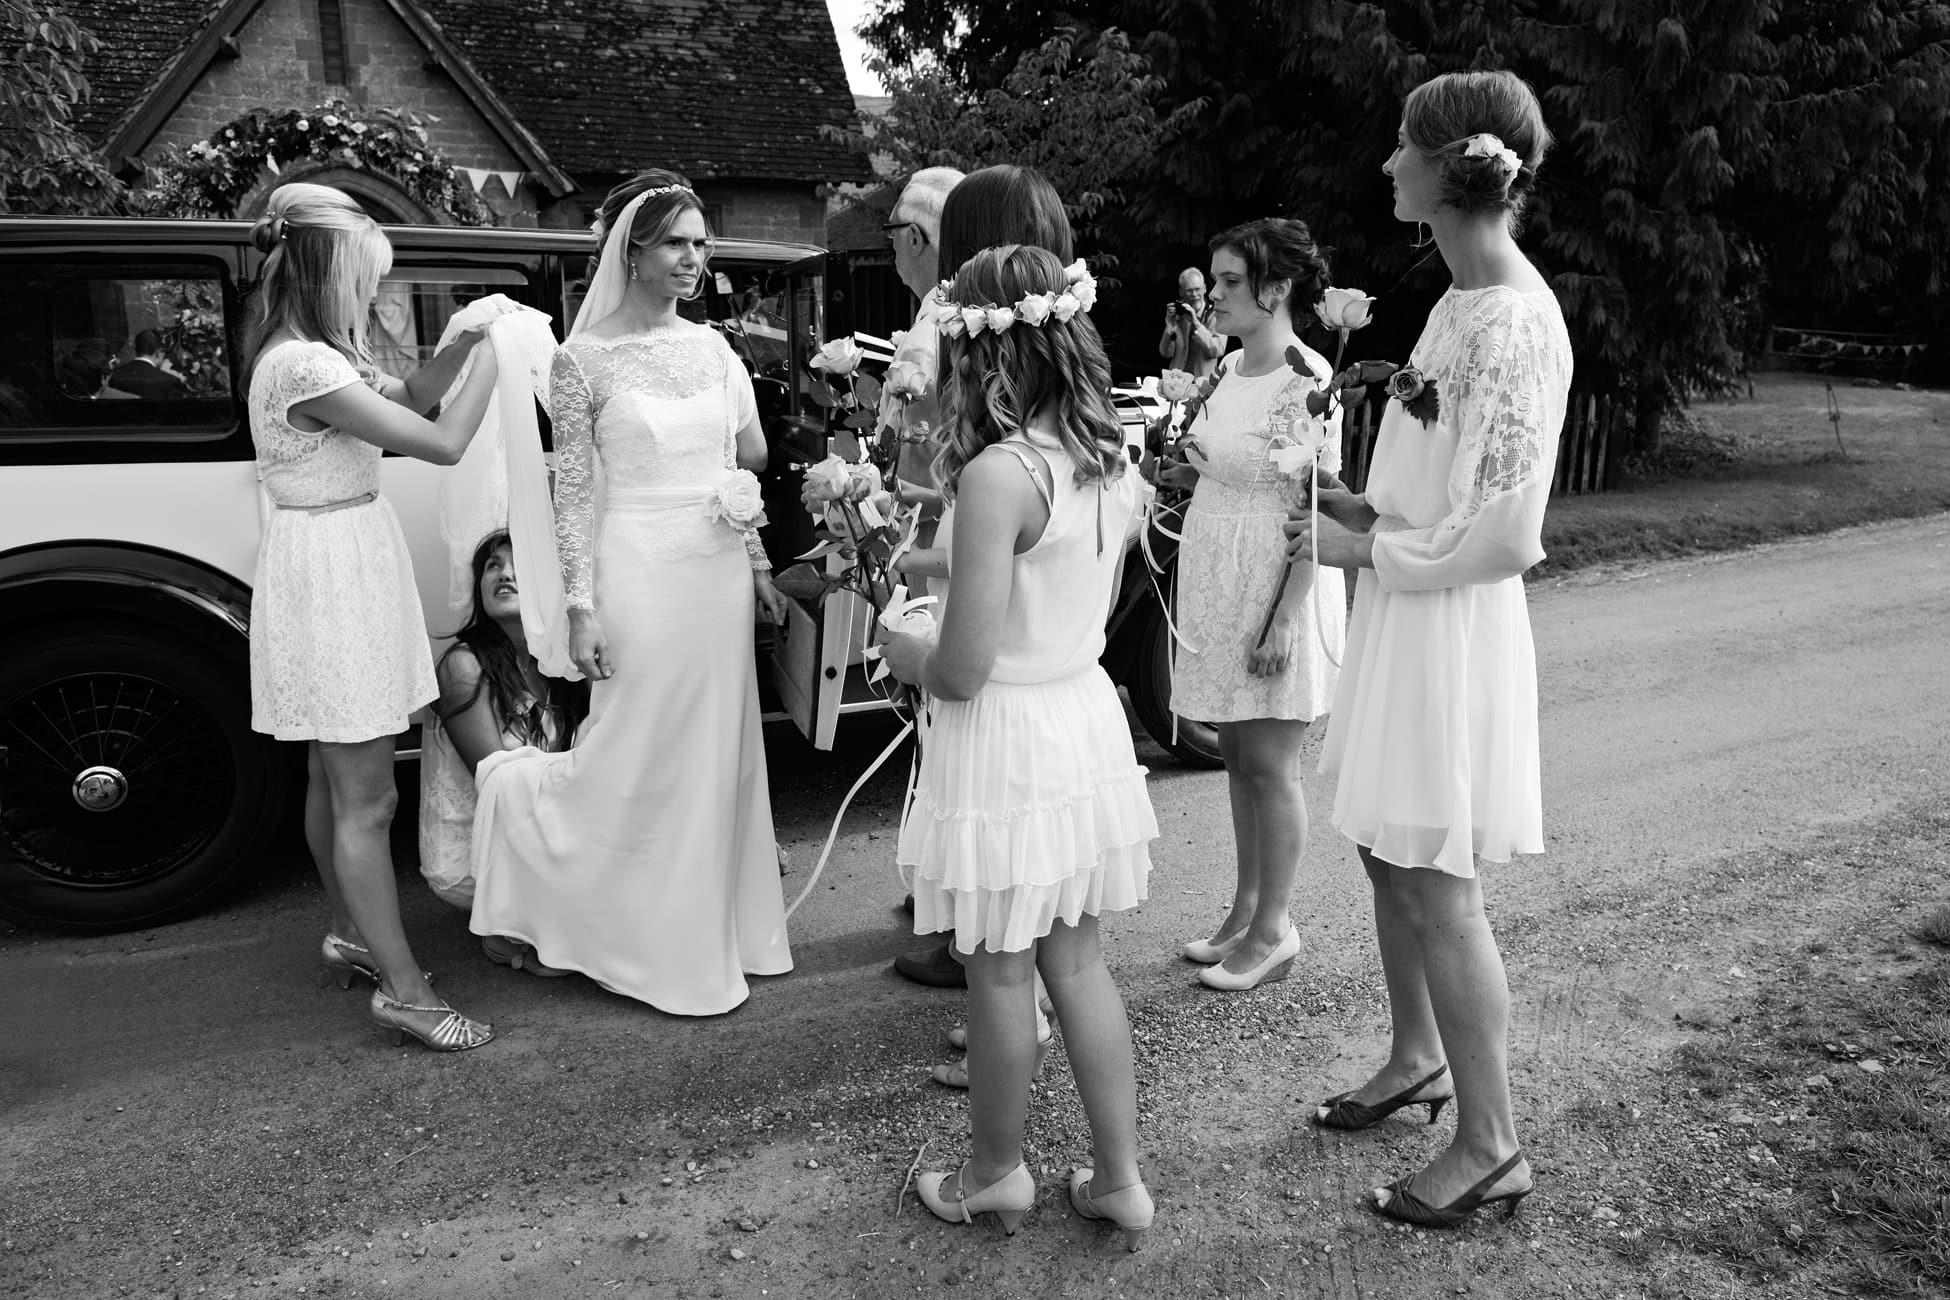 bridesmaid-adjusts-wedding-dress